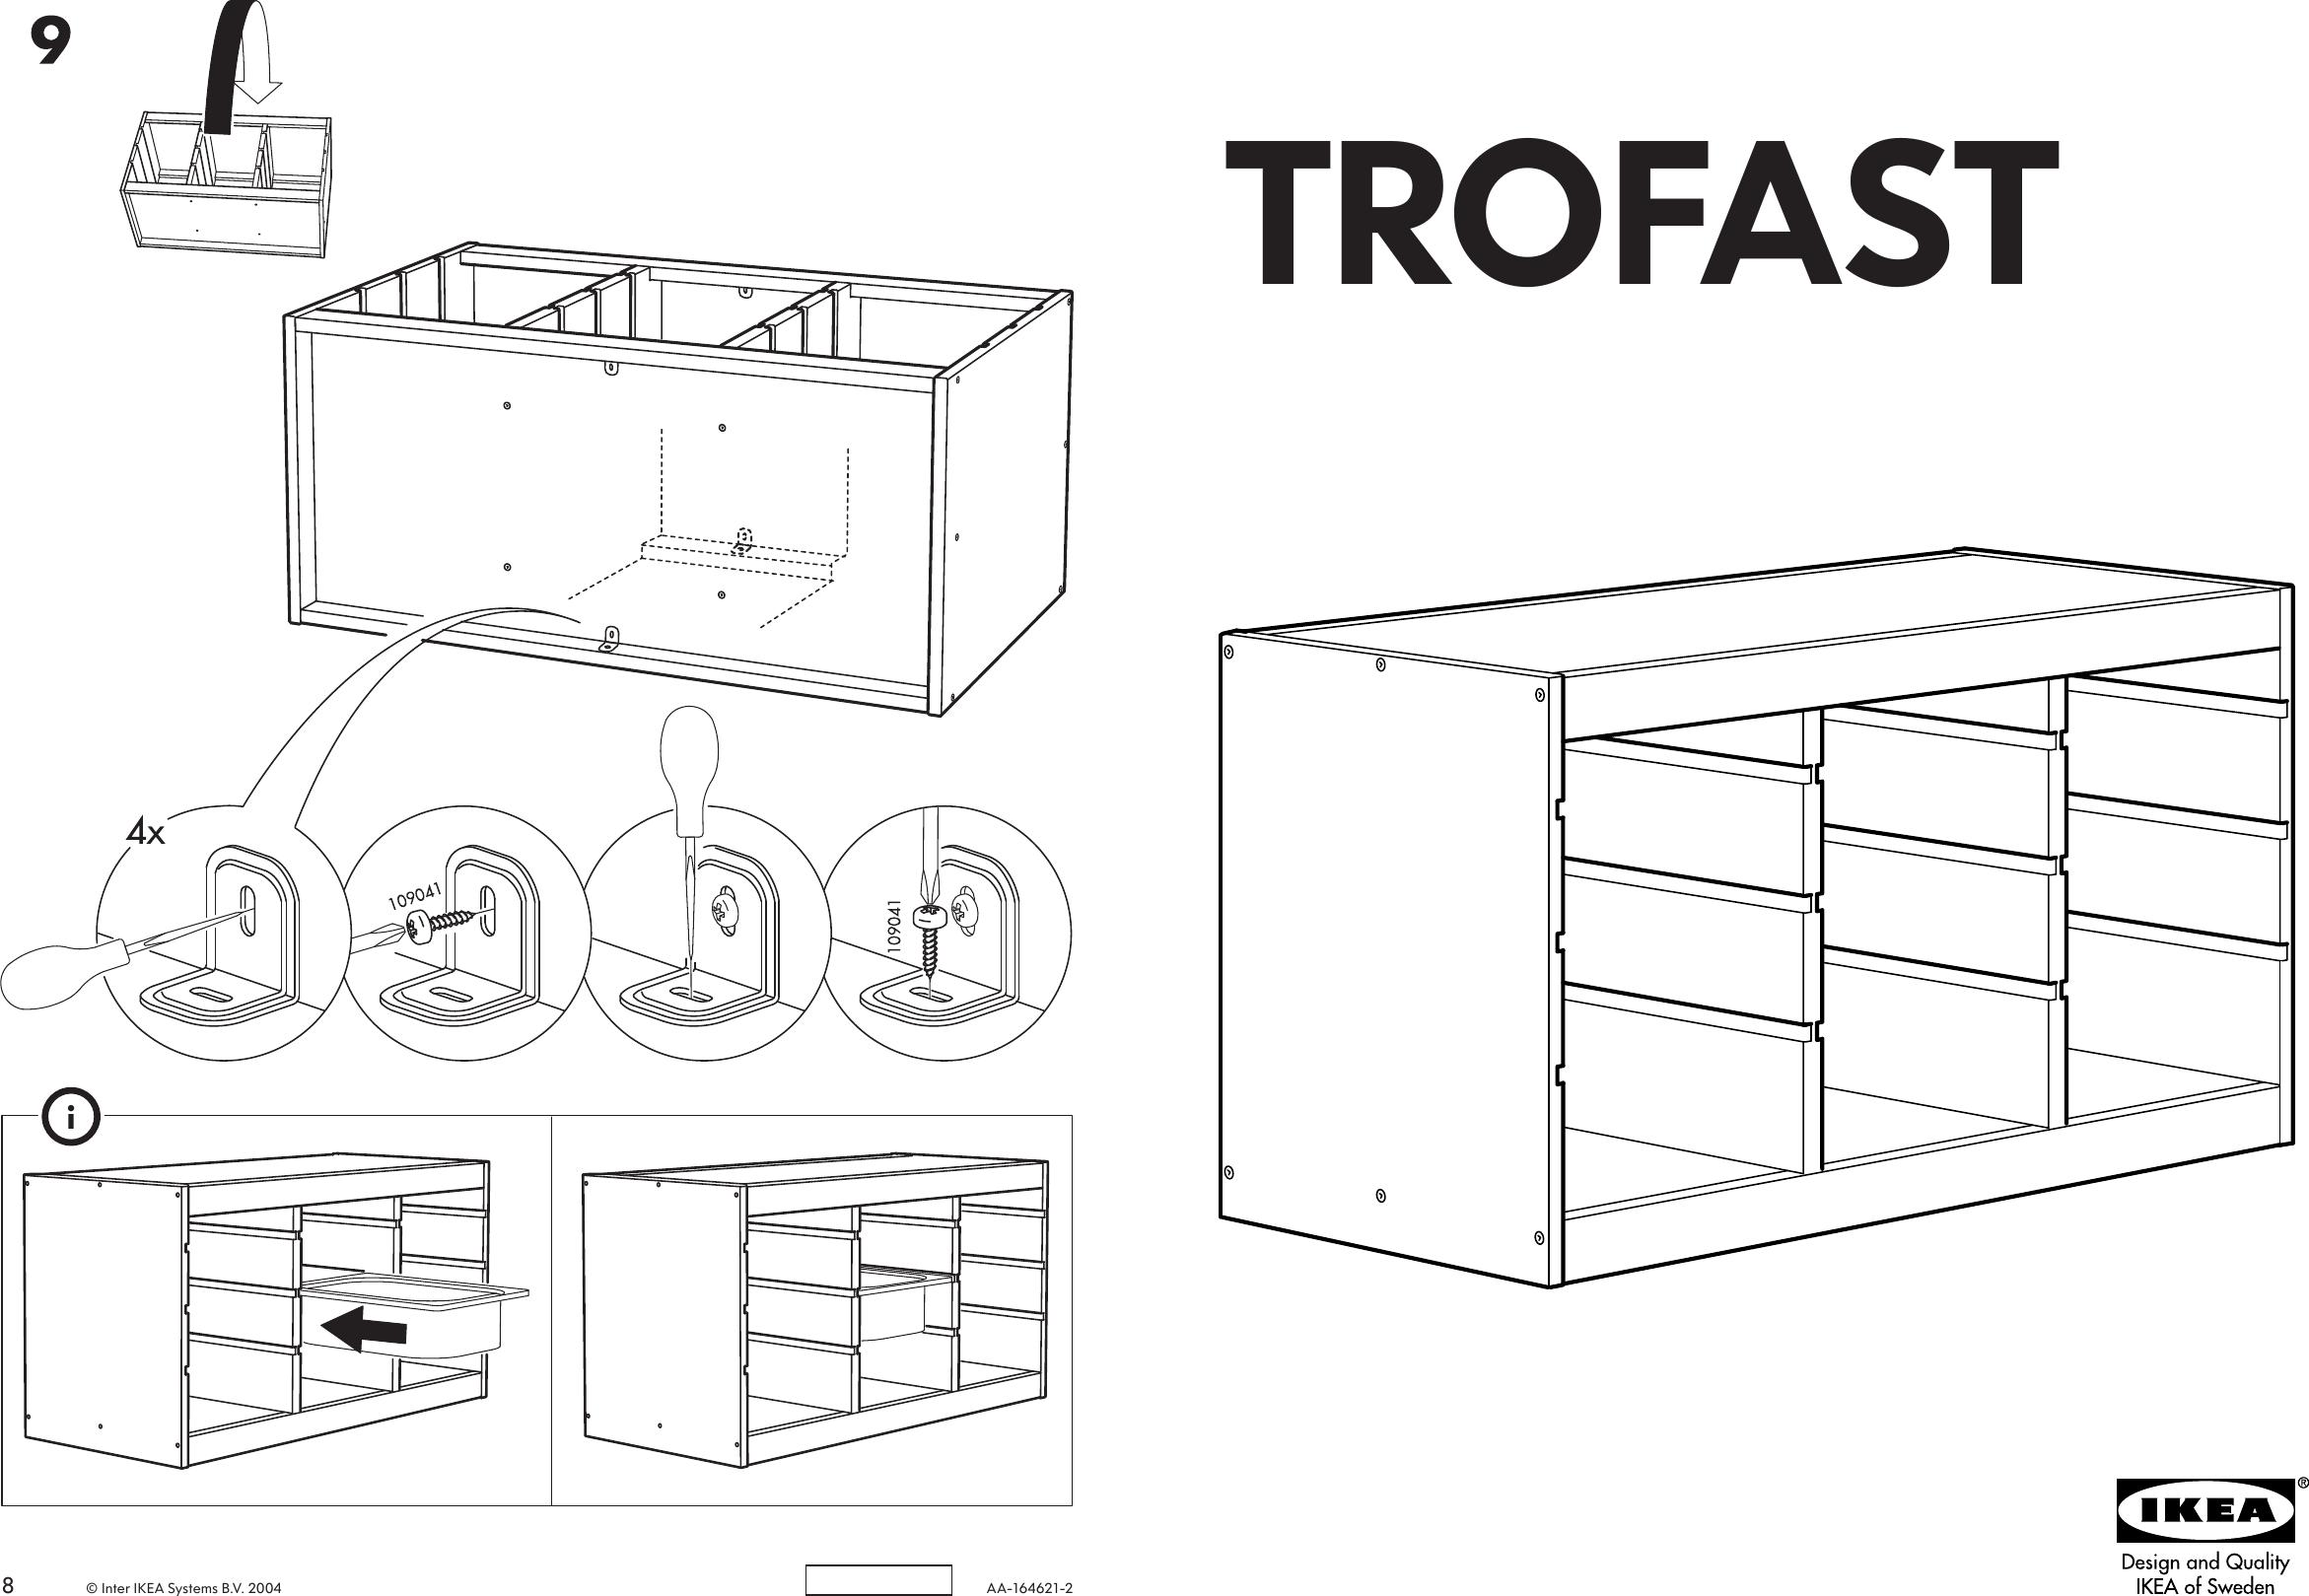 Ikea Trofast Frame 37X20 1 2 Assembly Instruction